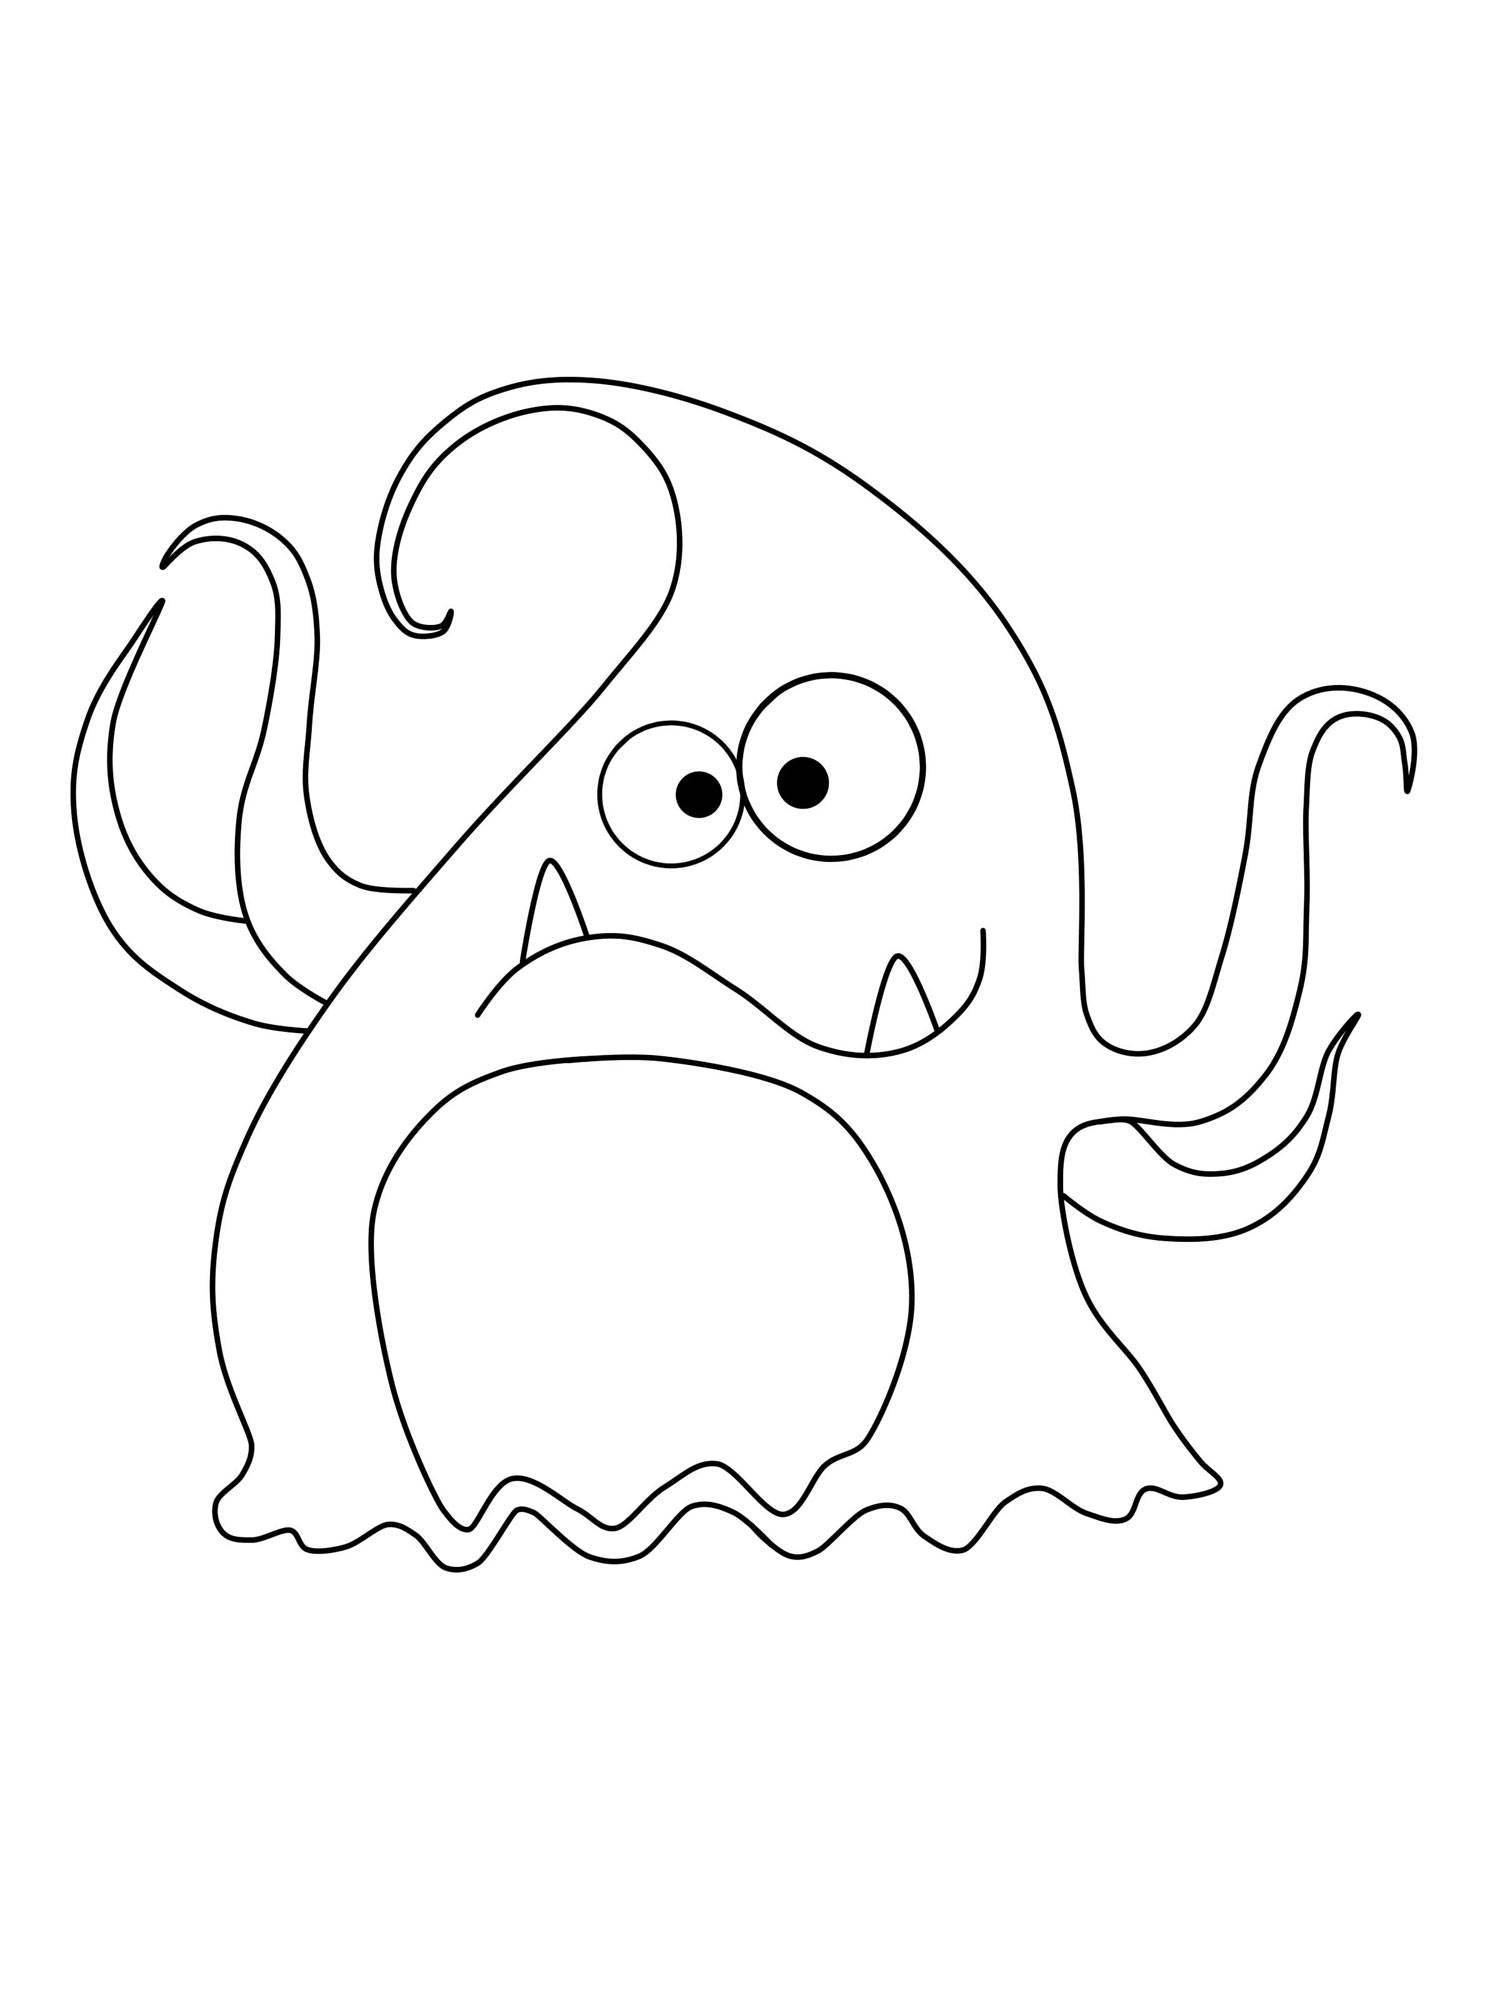 Ausmalbild Halloween Tentakel Monster Kostenlos Ausdrucken